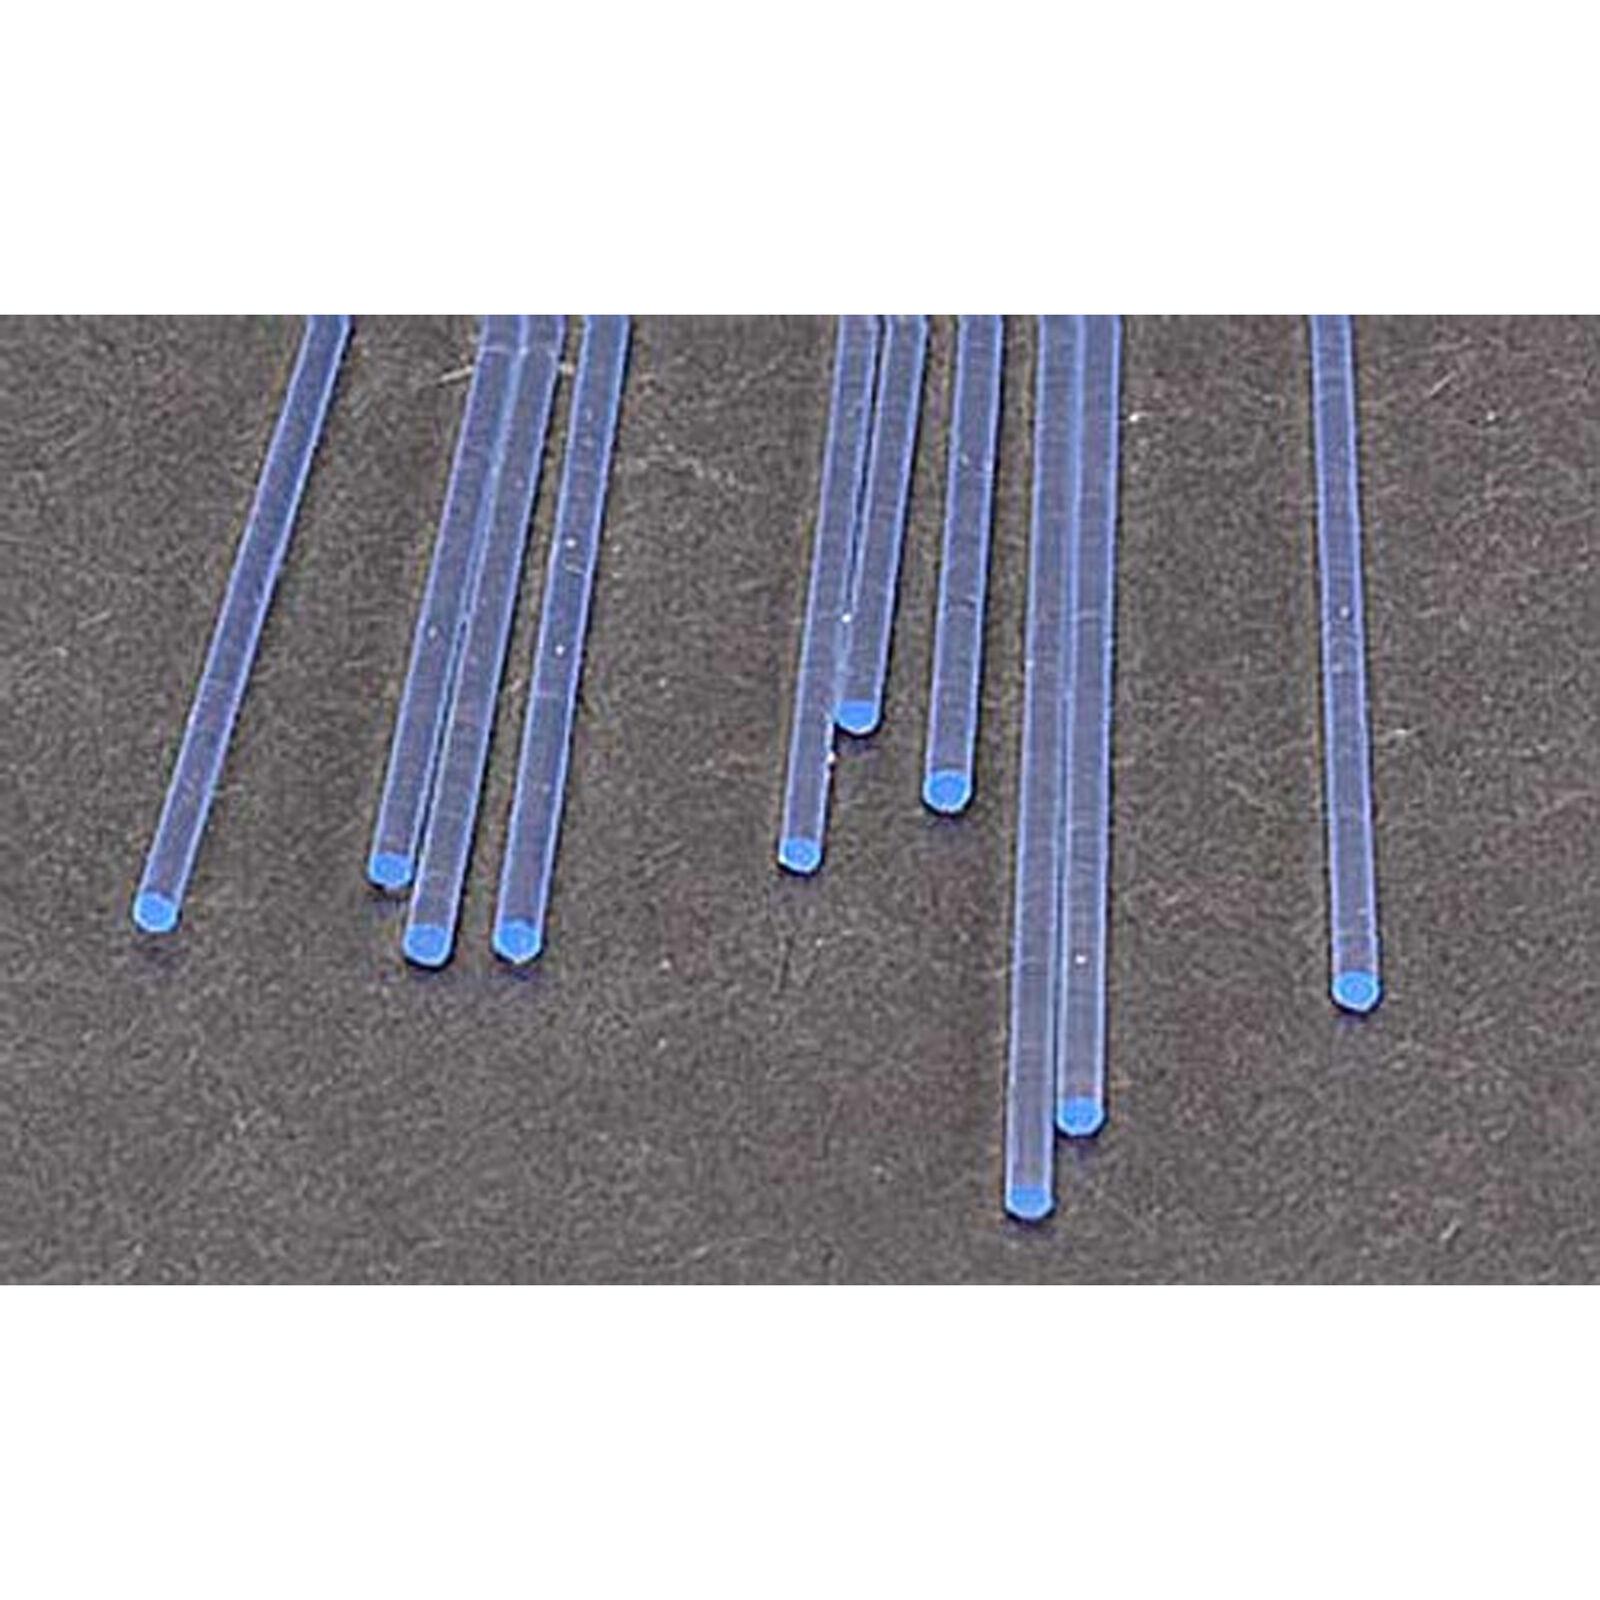 "FARB-2H Fluor Blue Rod,1/16"" (10)"